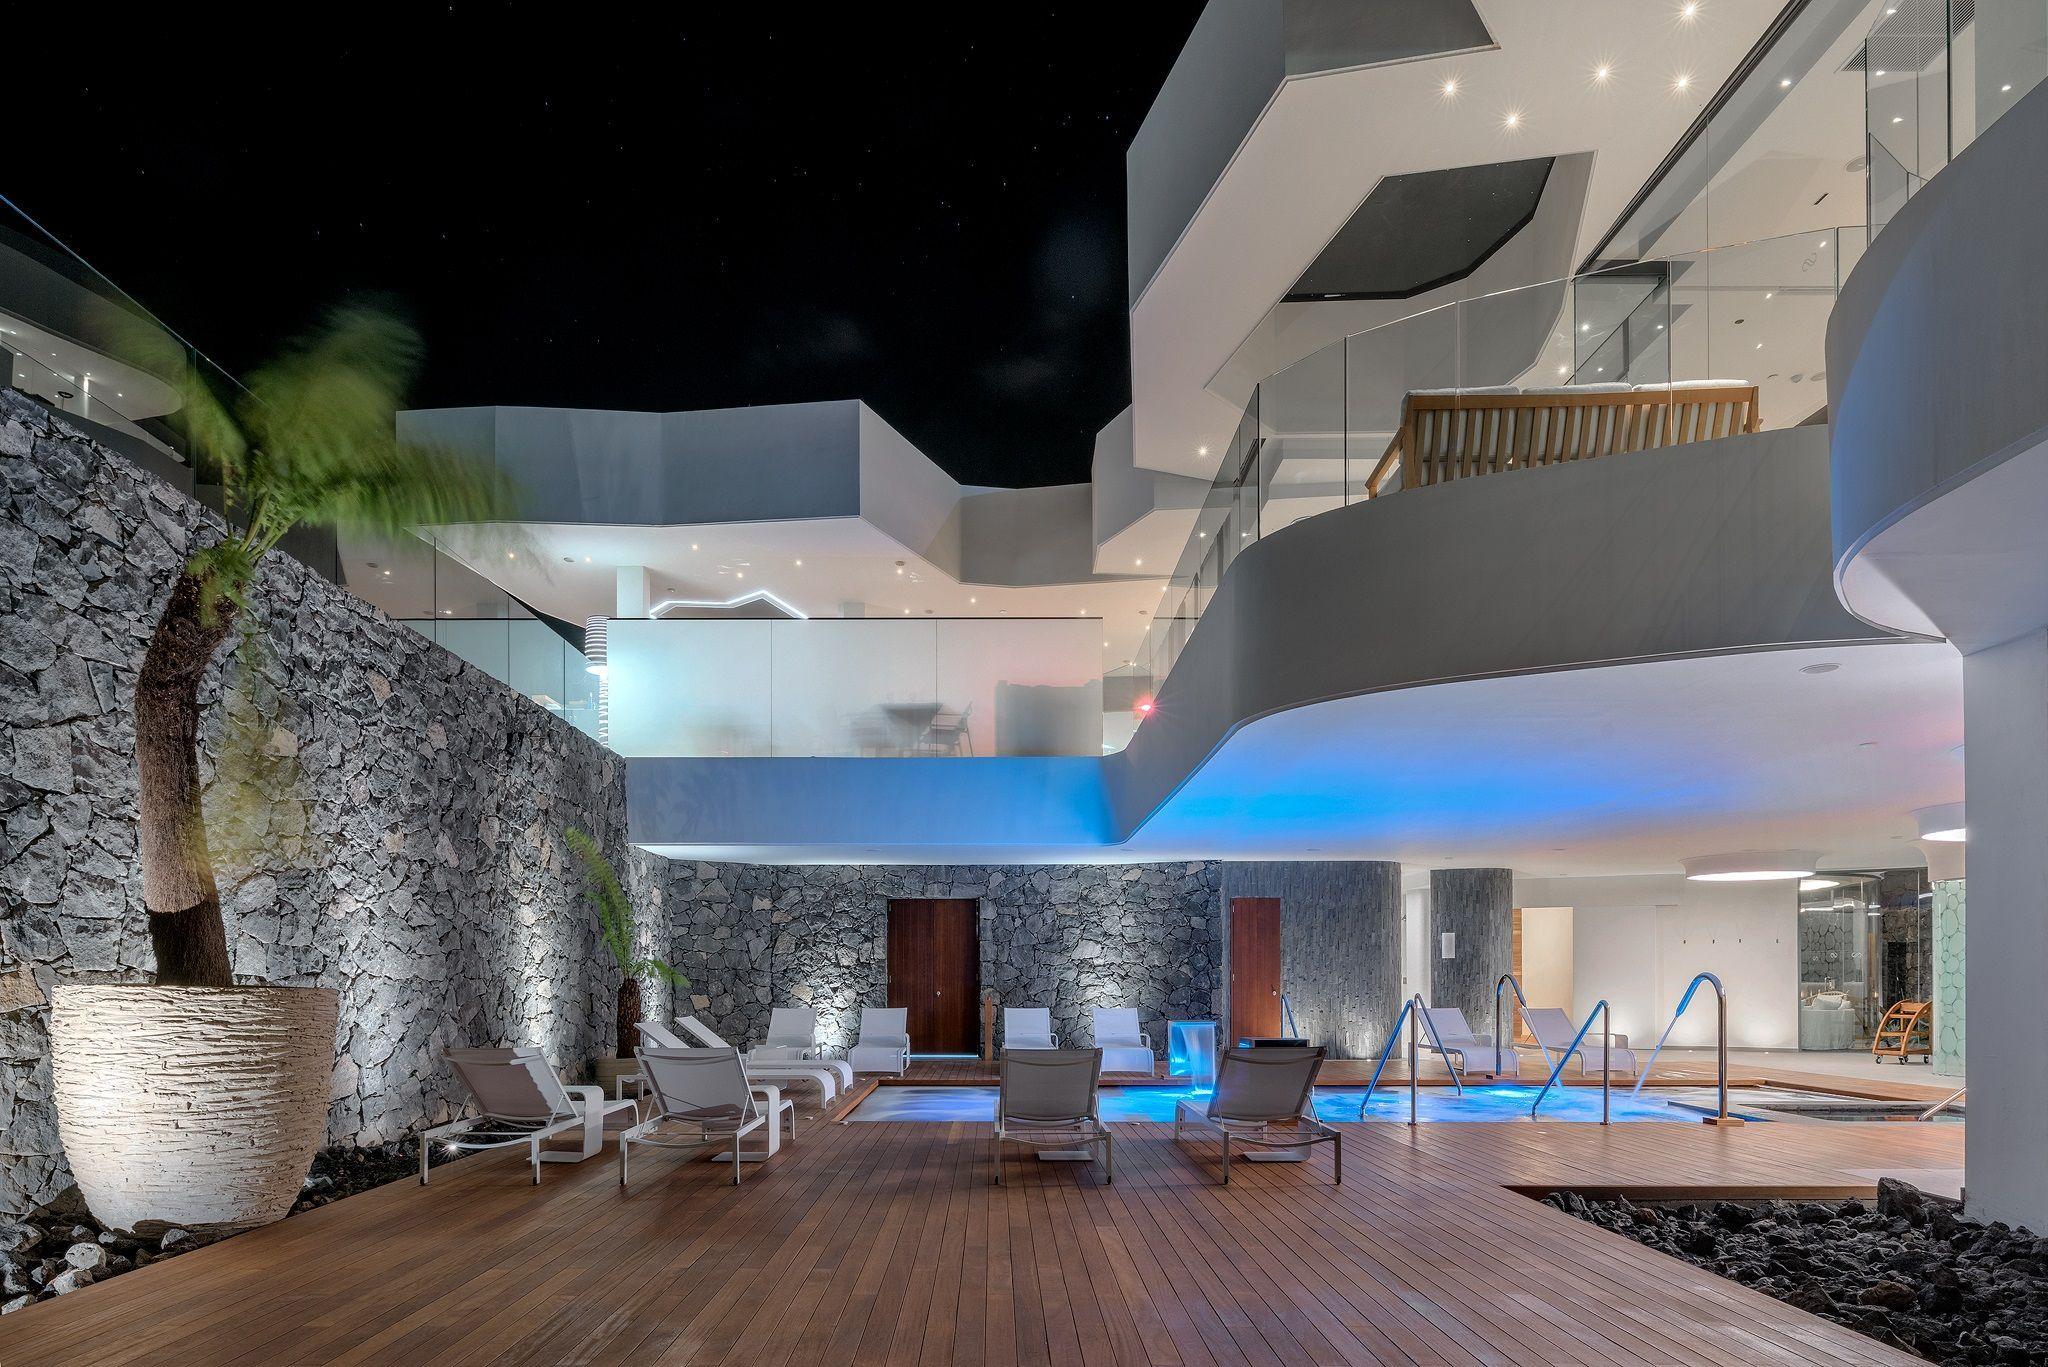 01b5efbacac7bc0cc932390750f96eae - Tenerife Royal Gardens Apartments For Sale